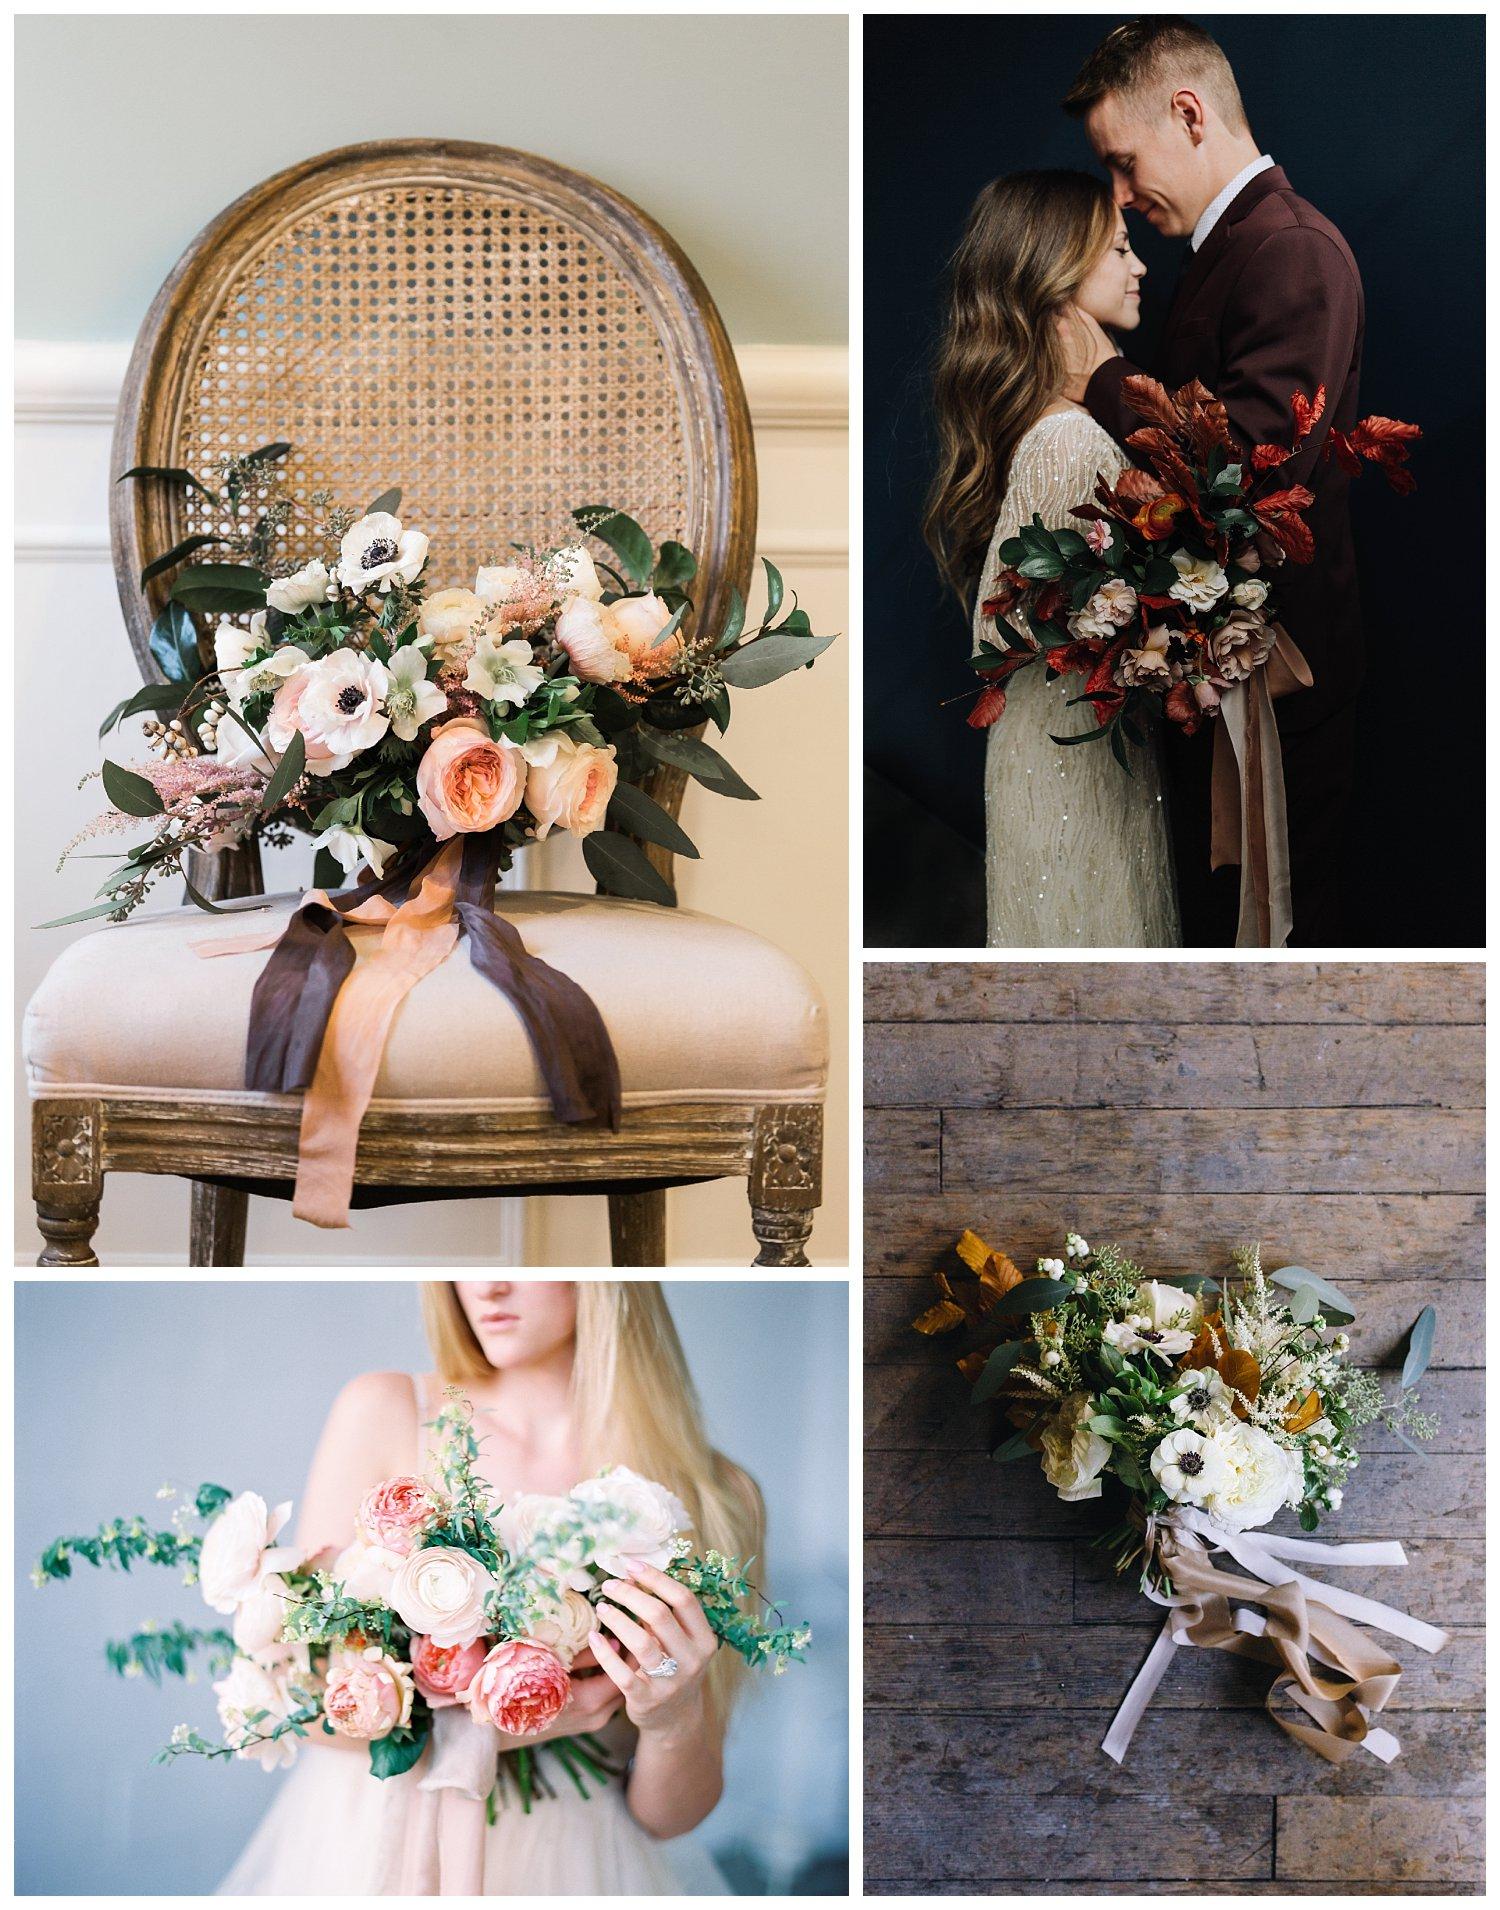 Top left: Rachel Lindsey Photography | Bottom left: Brushfire Photography | Top right: Talia Photography | Bottom right: Burlap and Blossom